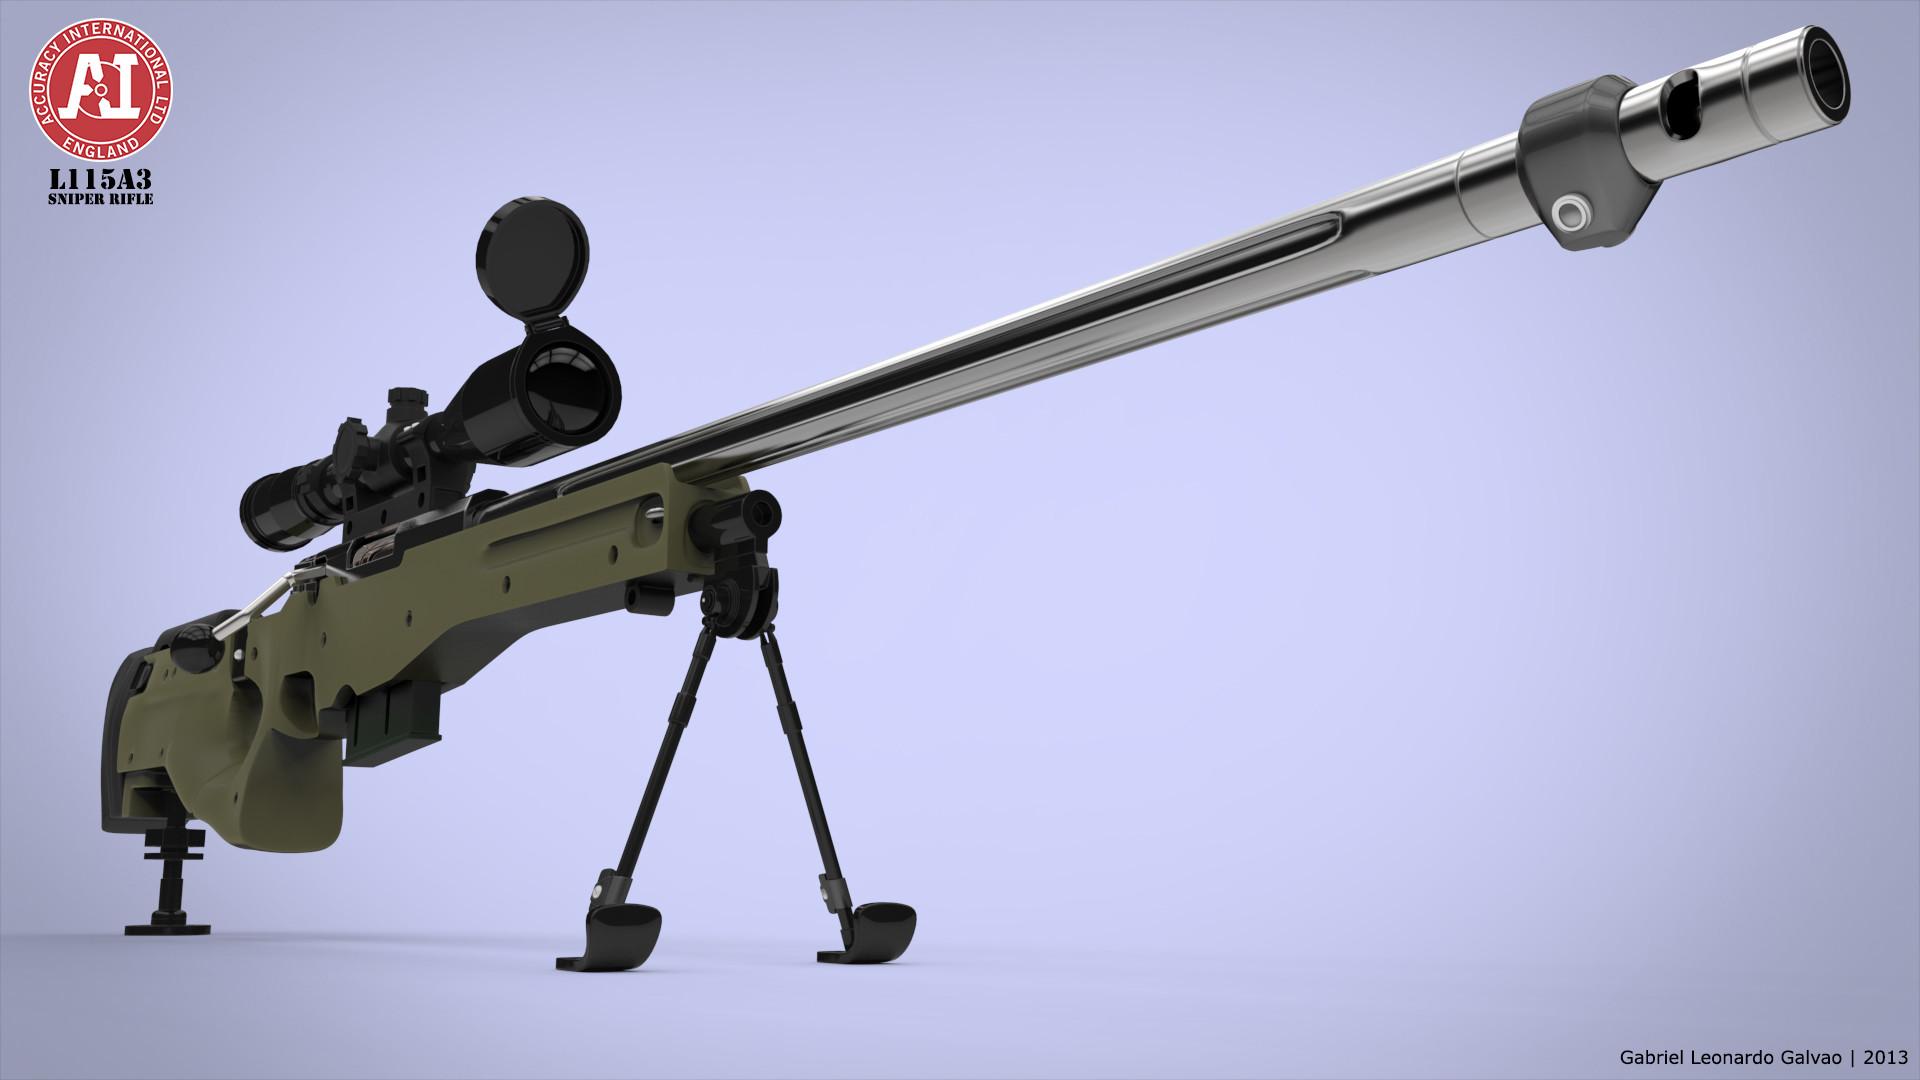 Artstation L115a3 Sniper Rifle 3d Model Gabriel Leonardo Galvao